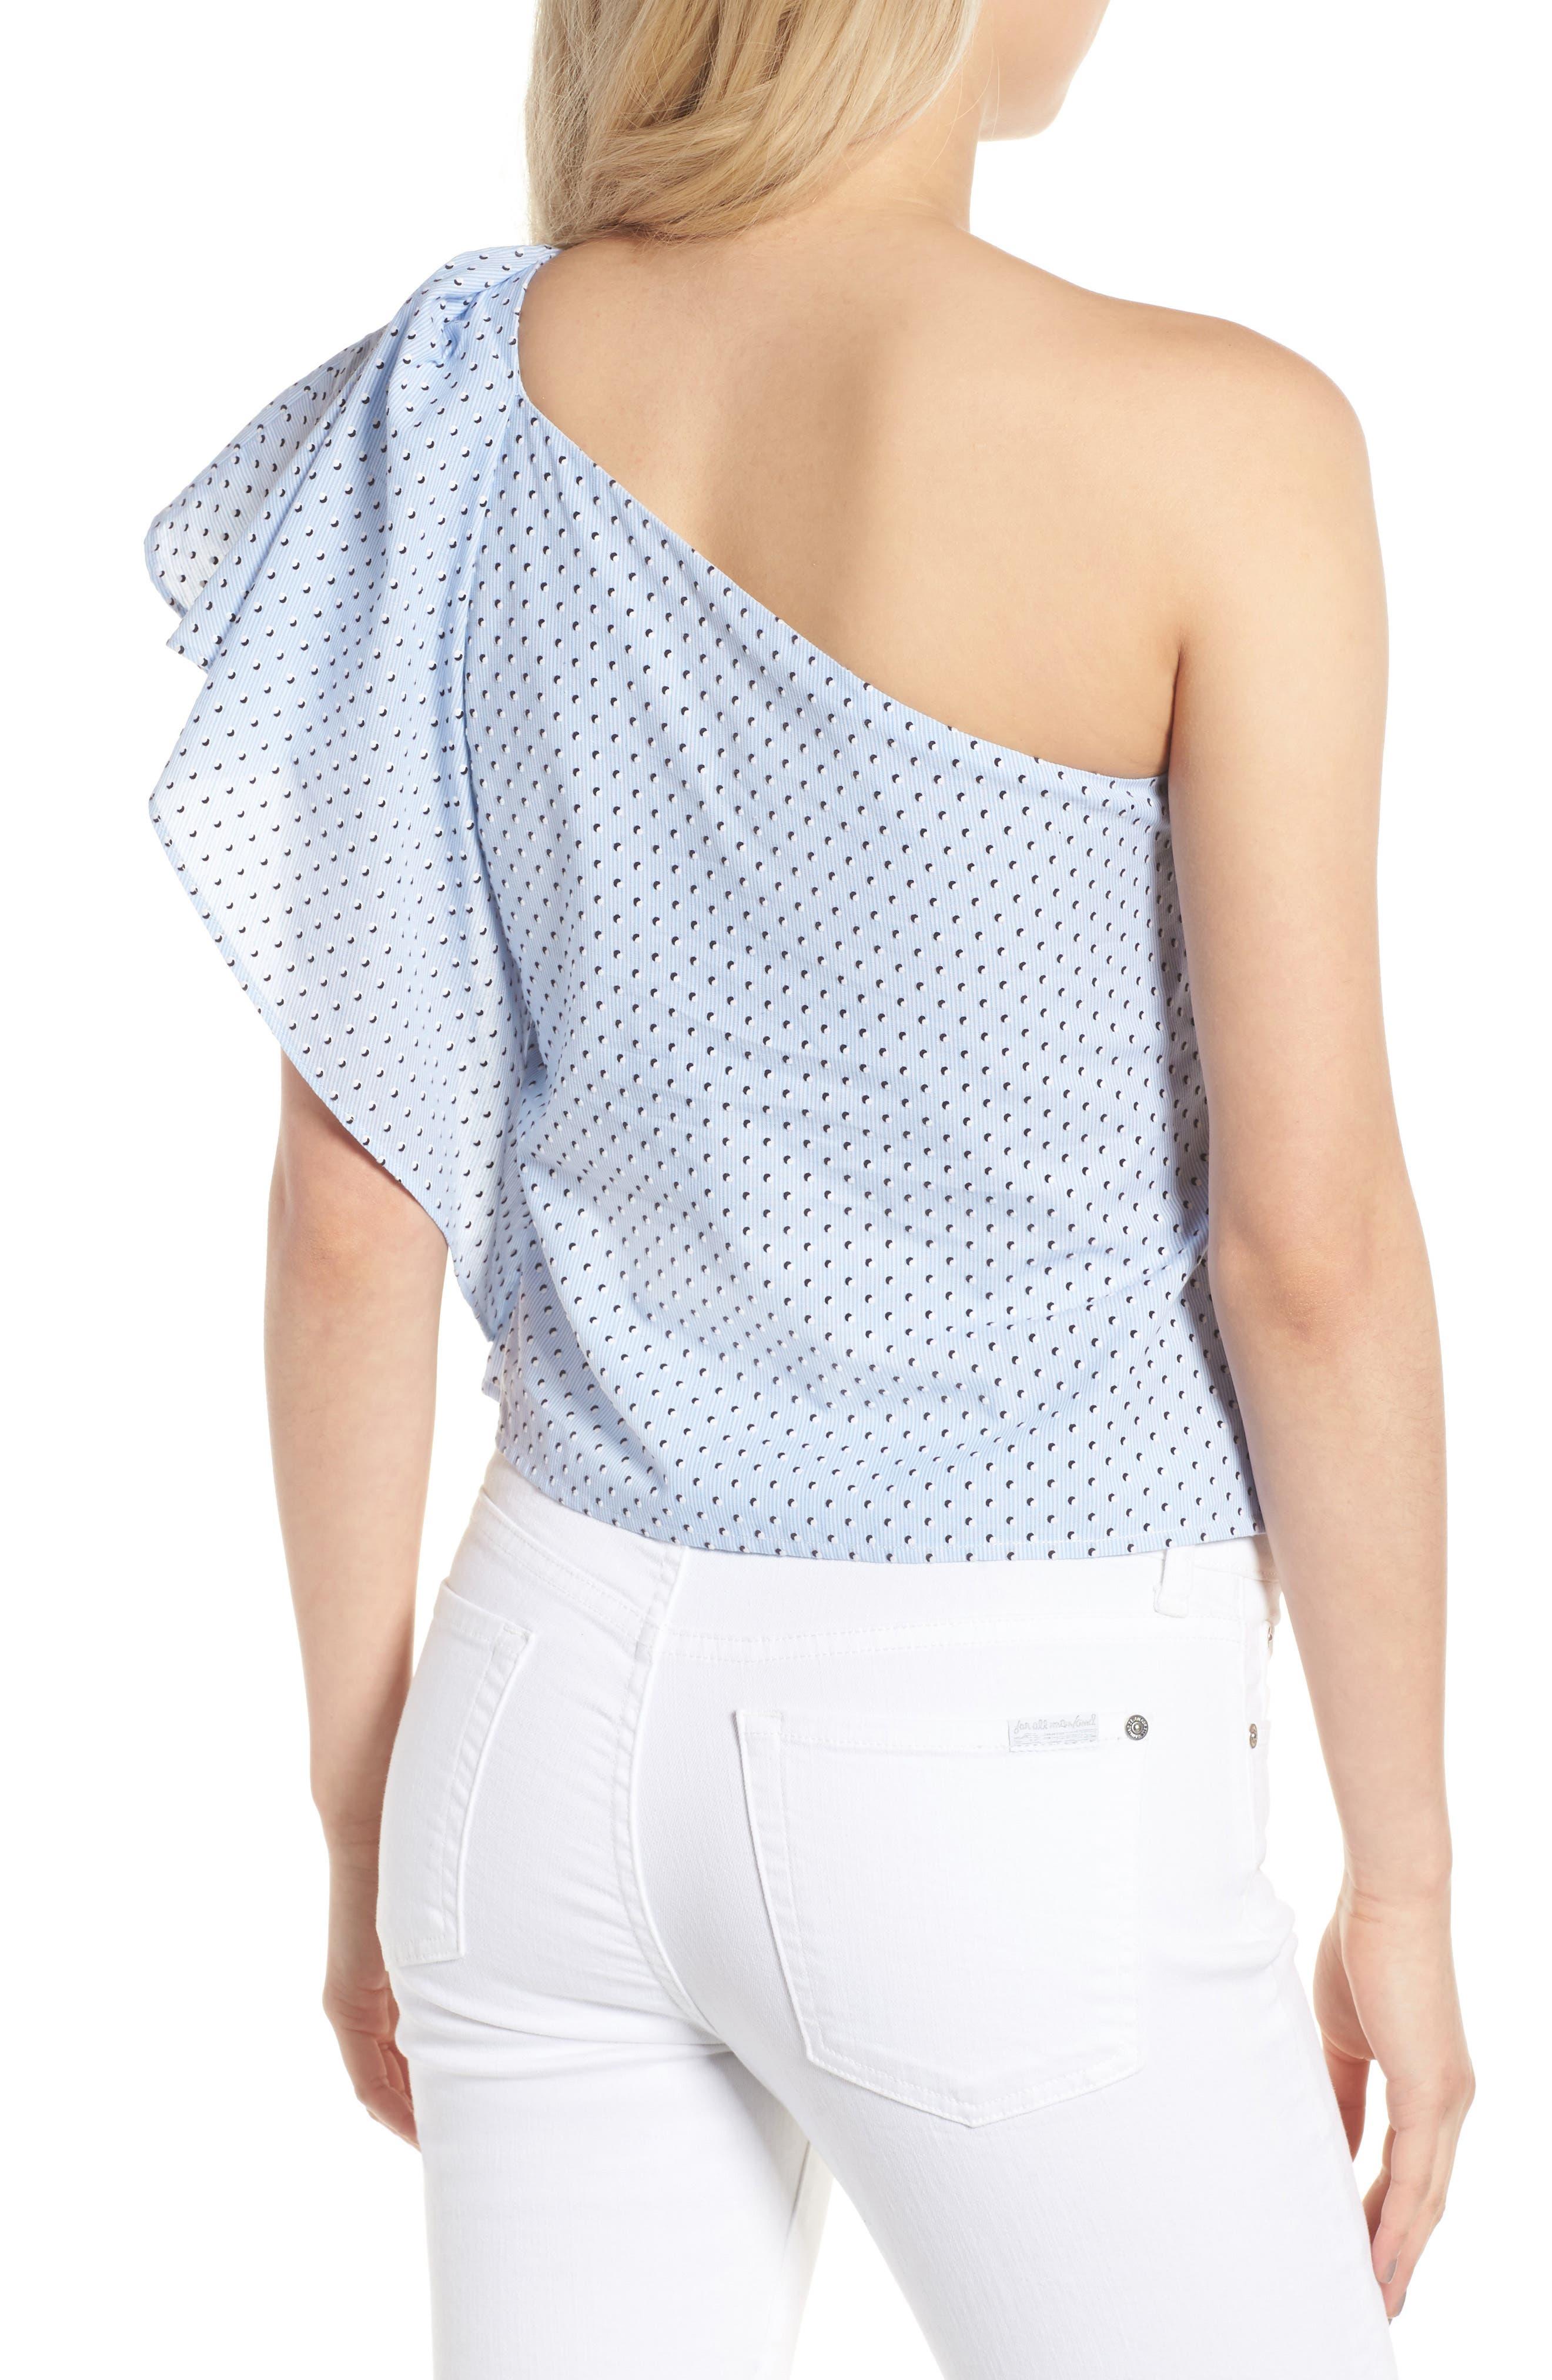 Livia One-Shoulder Top,                             Alternate thumbnail 2, color,                             Baby Blue